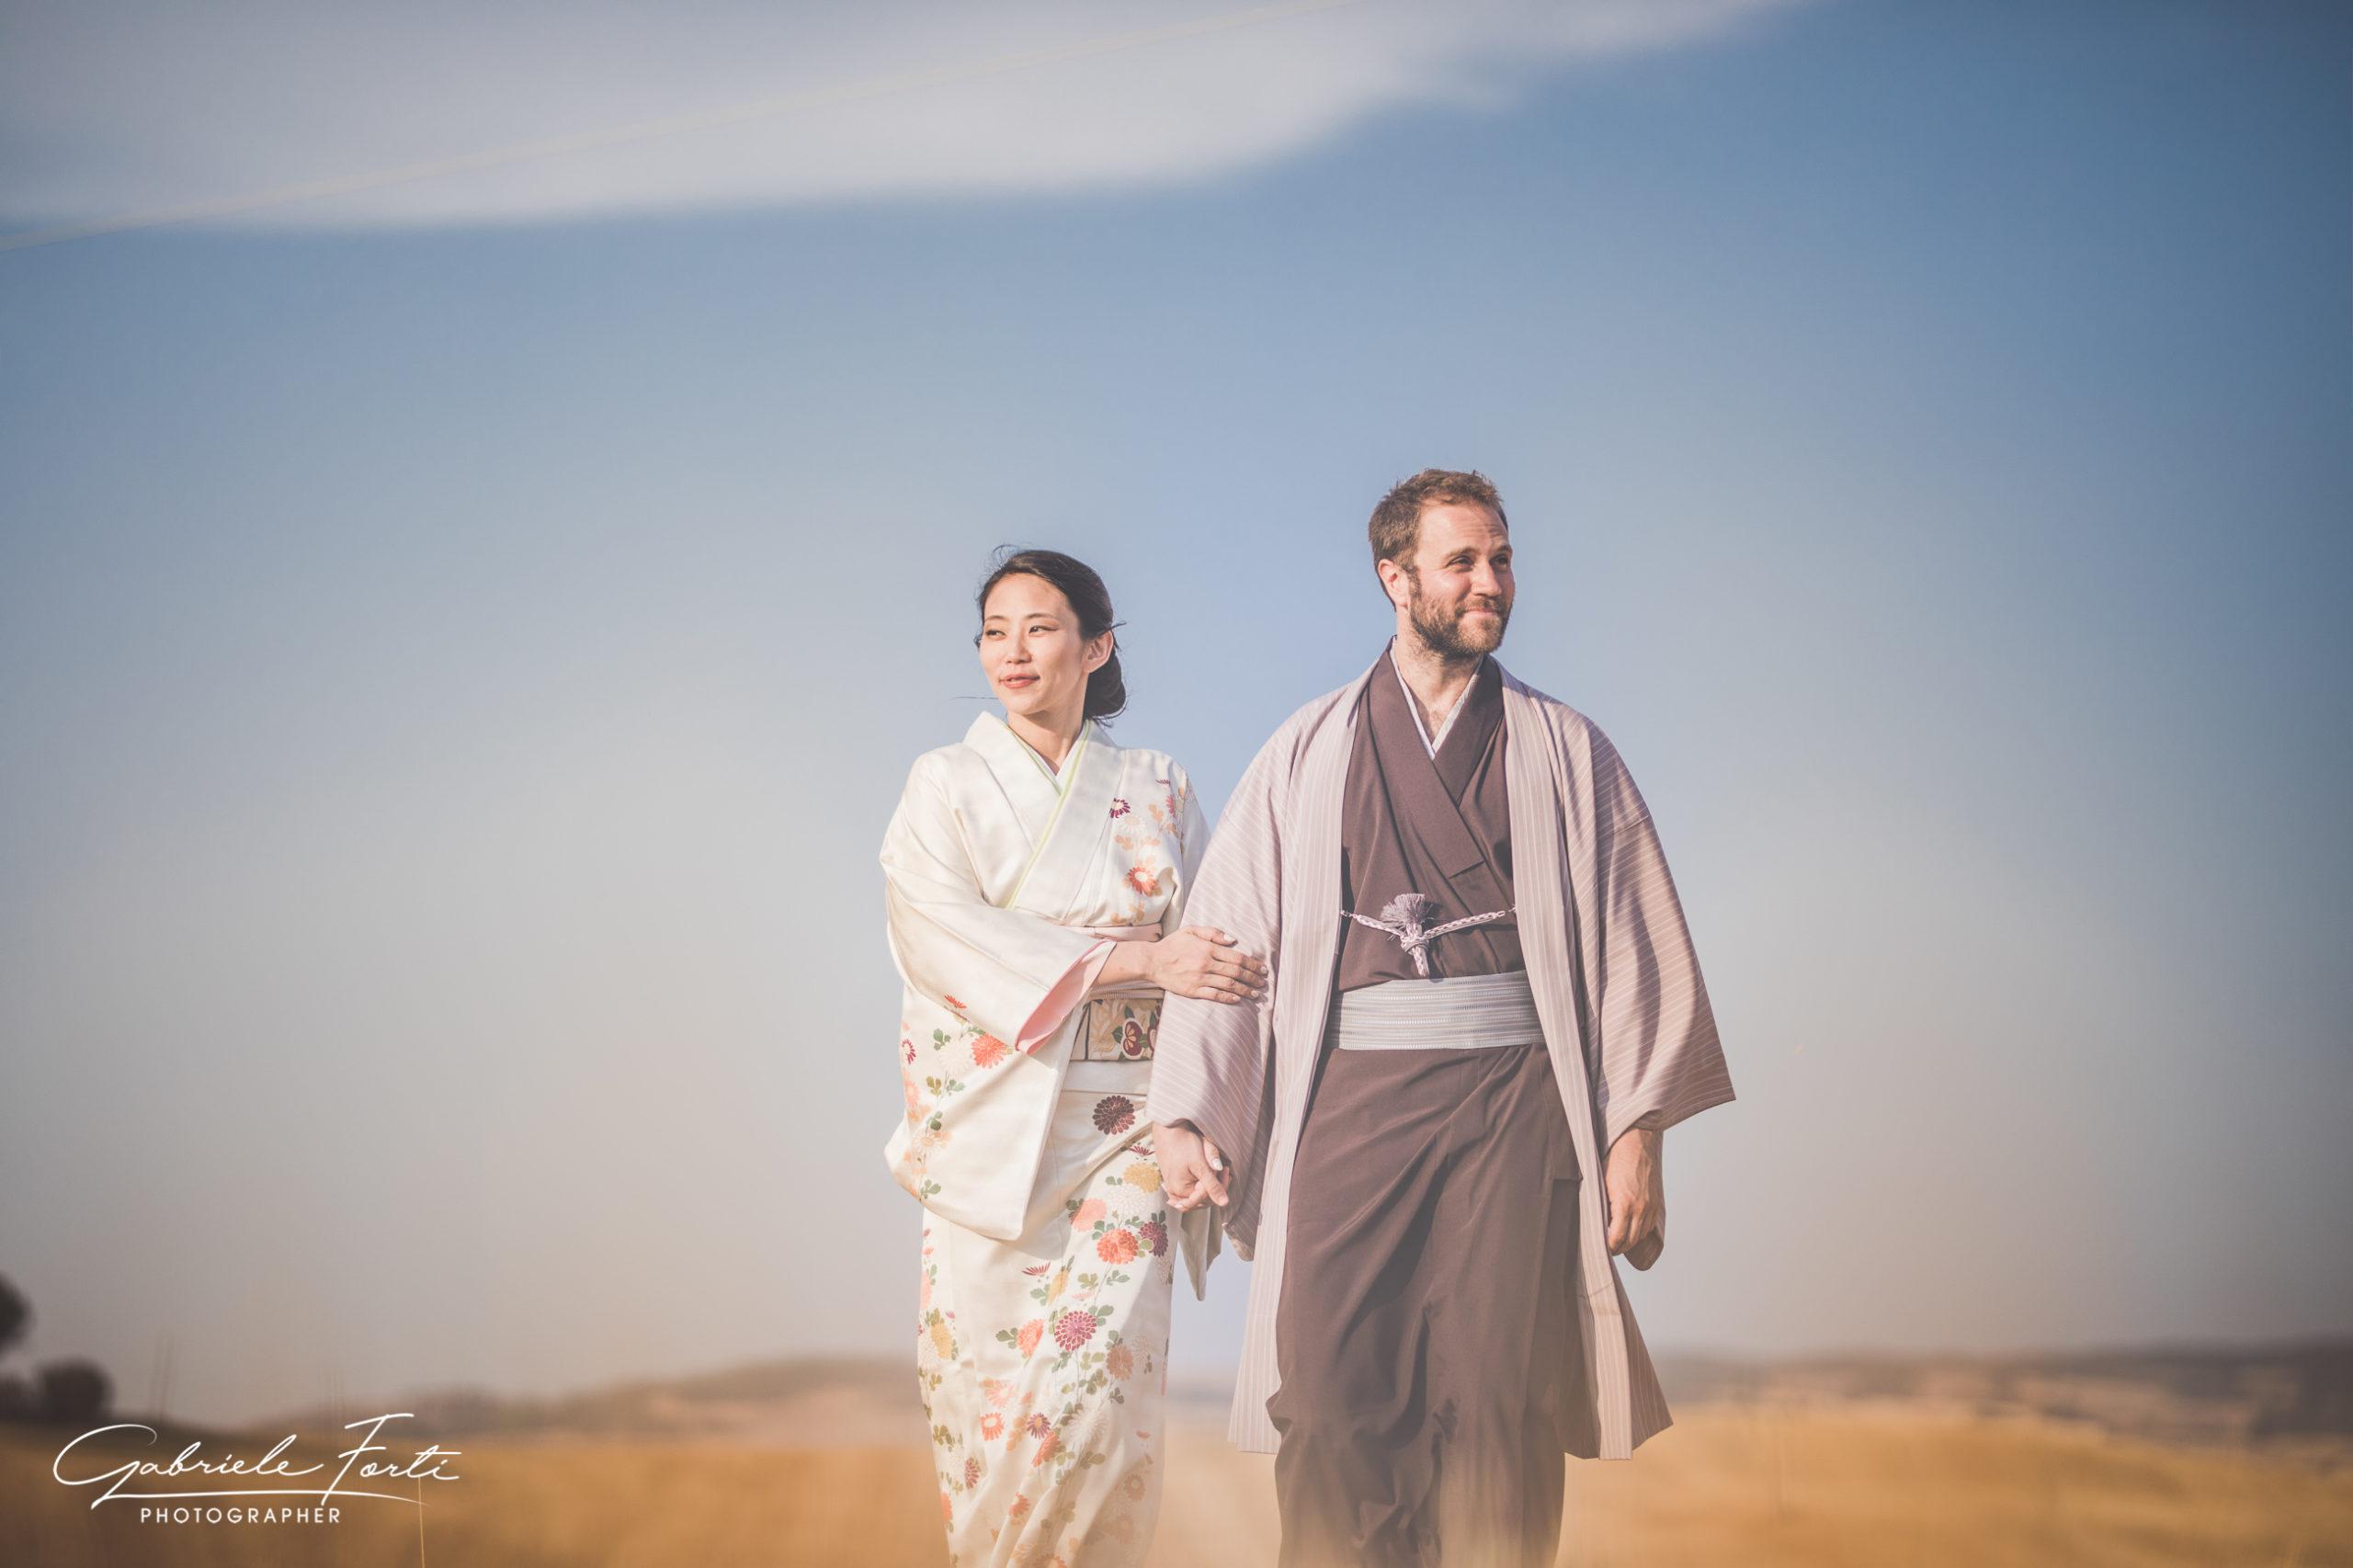 wedding-japan-tuscany-locanda-in-tuscany-photographer-siena-foto-forti-gabriele-2